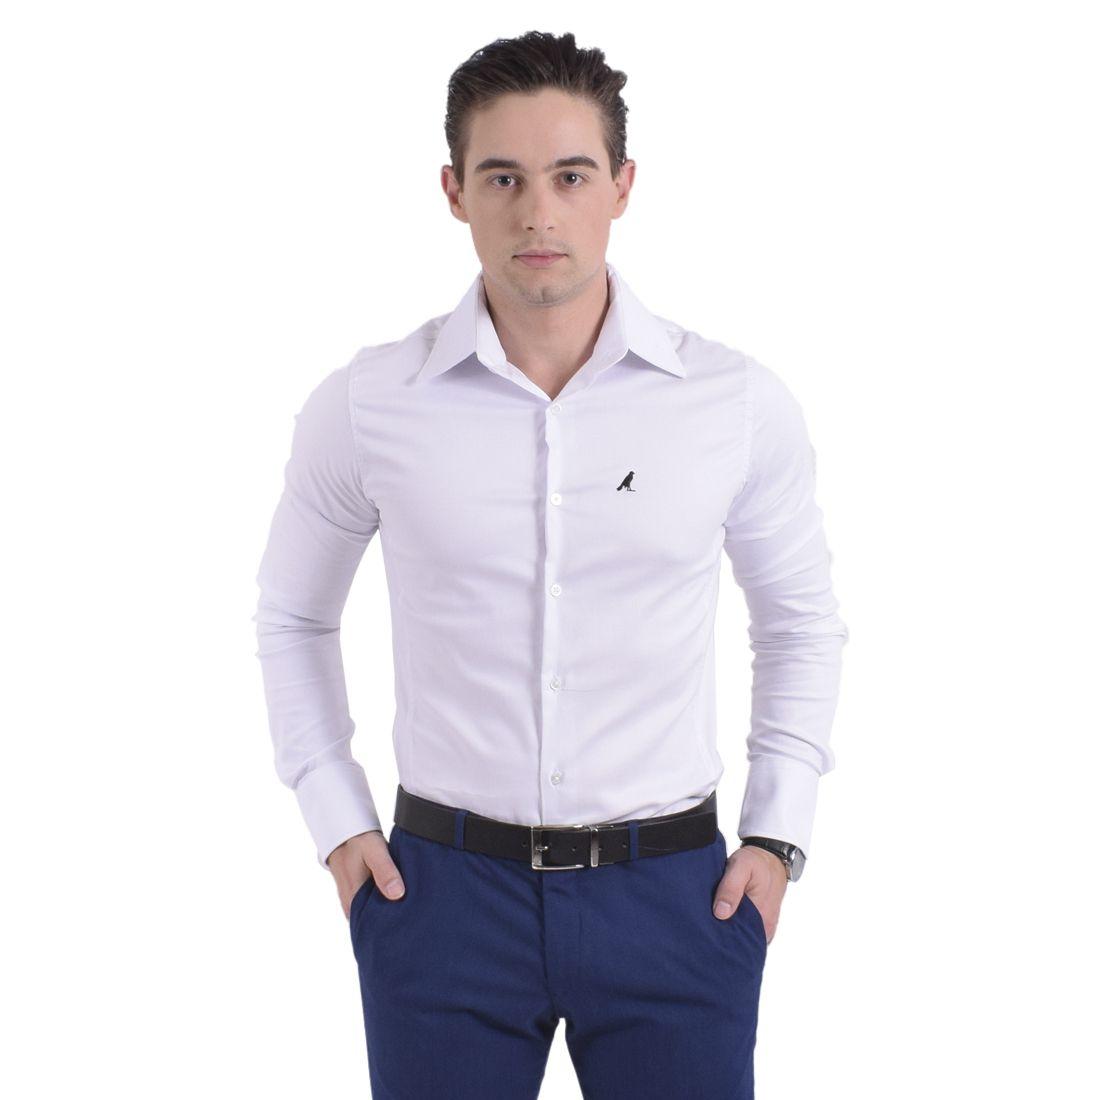 Camisa Social Branca Super Slim Masculina